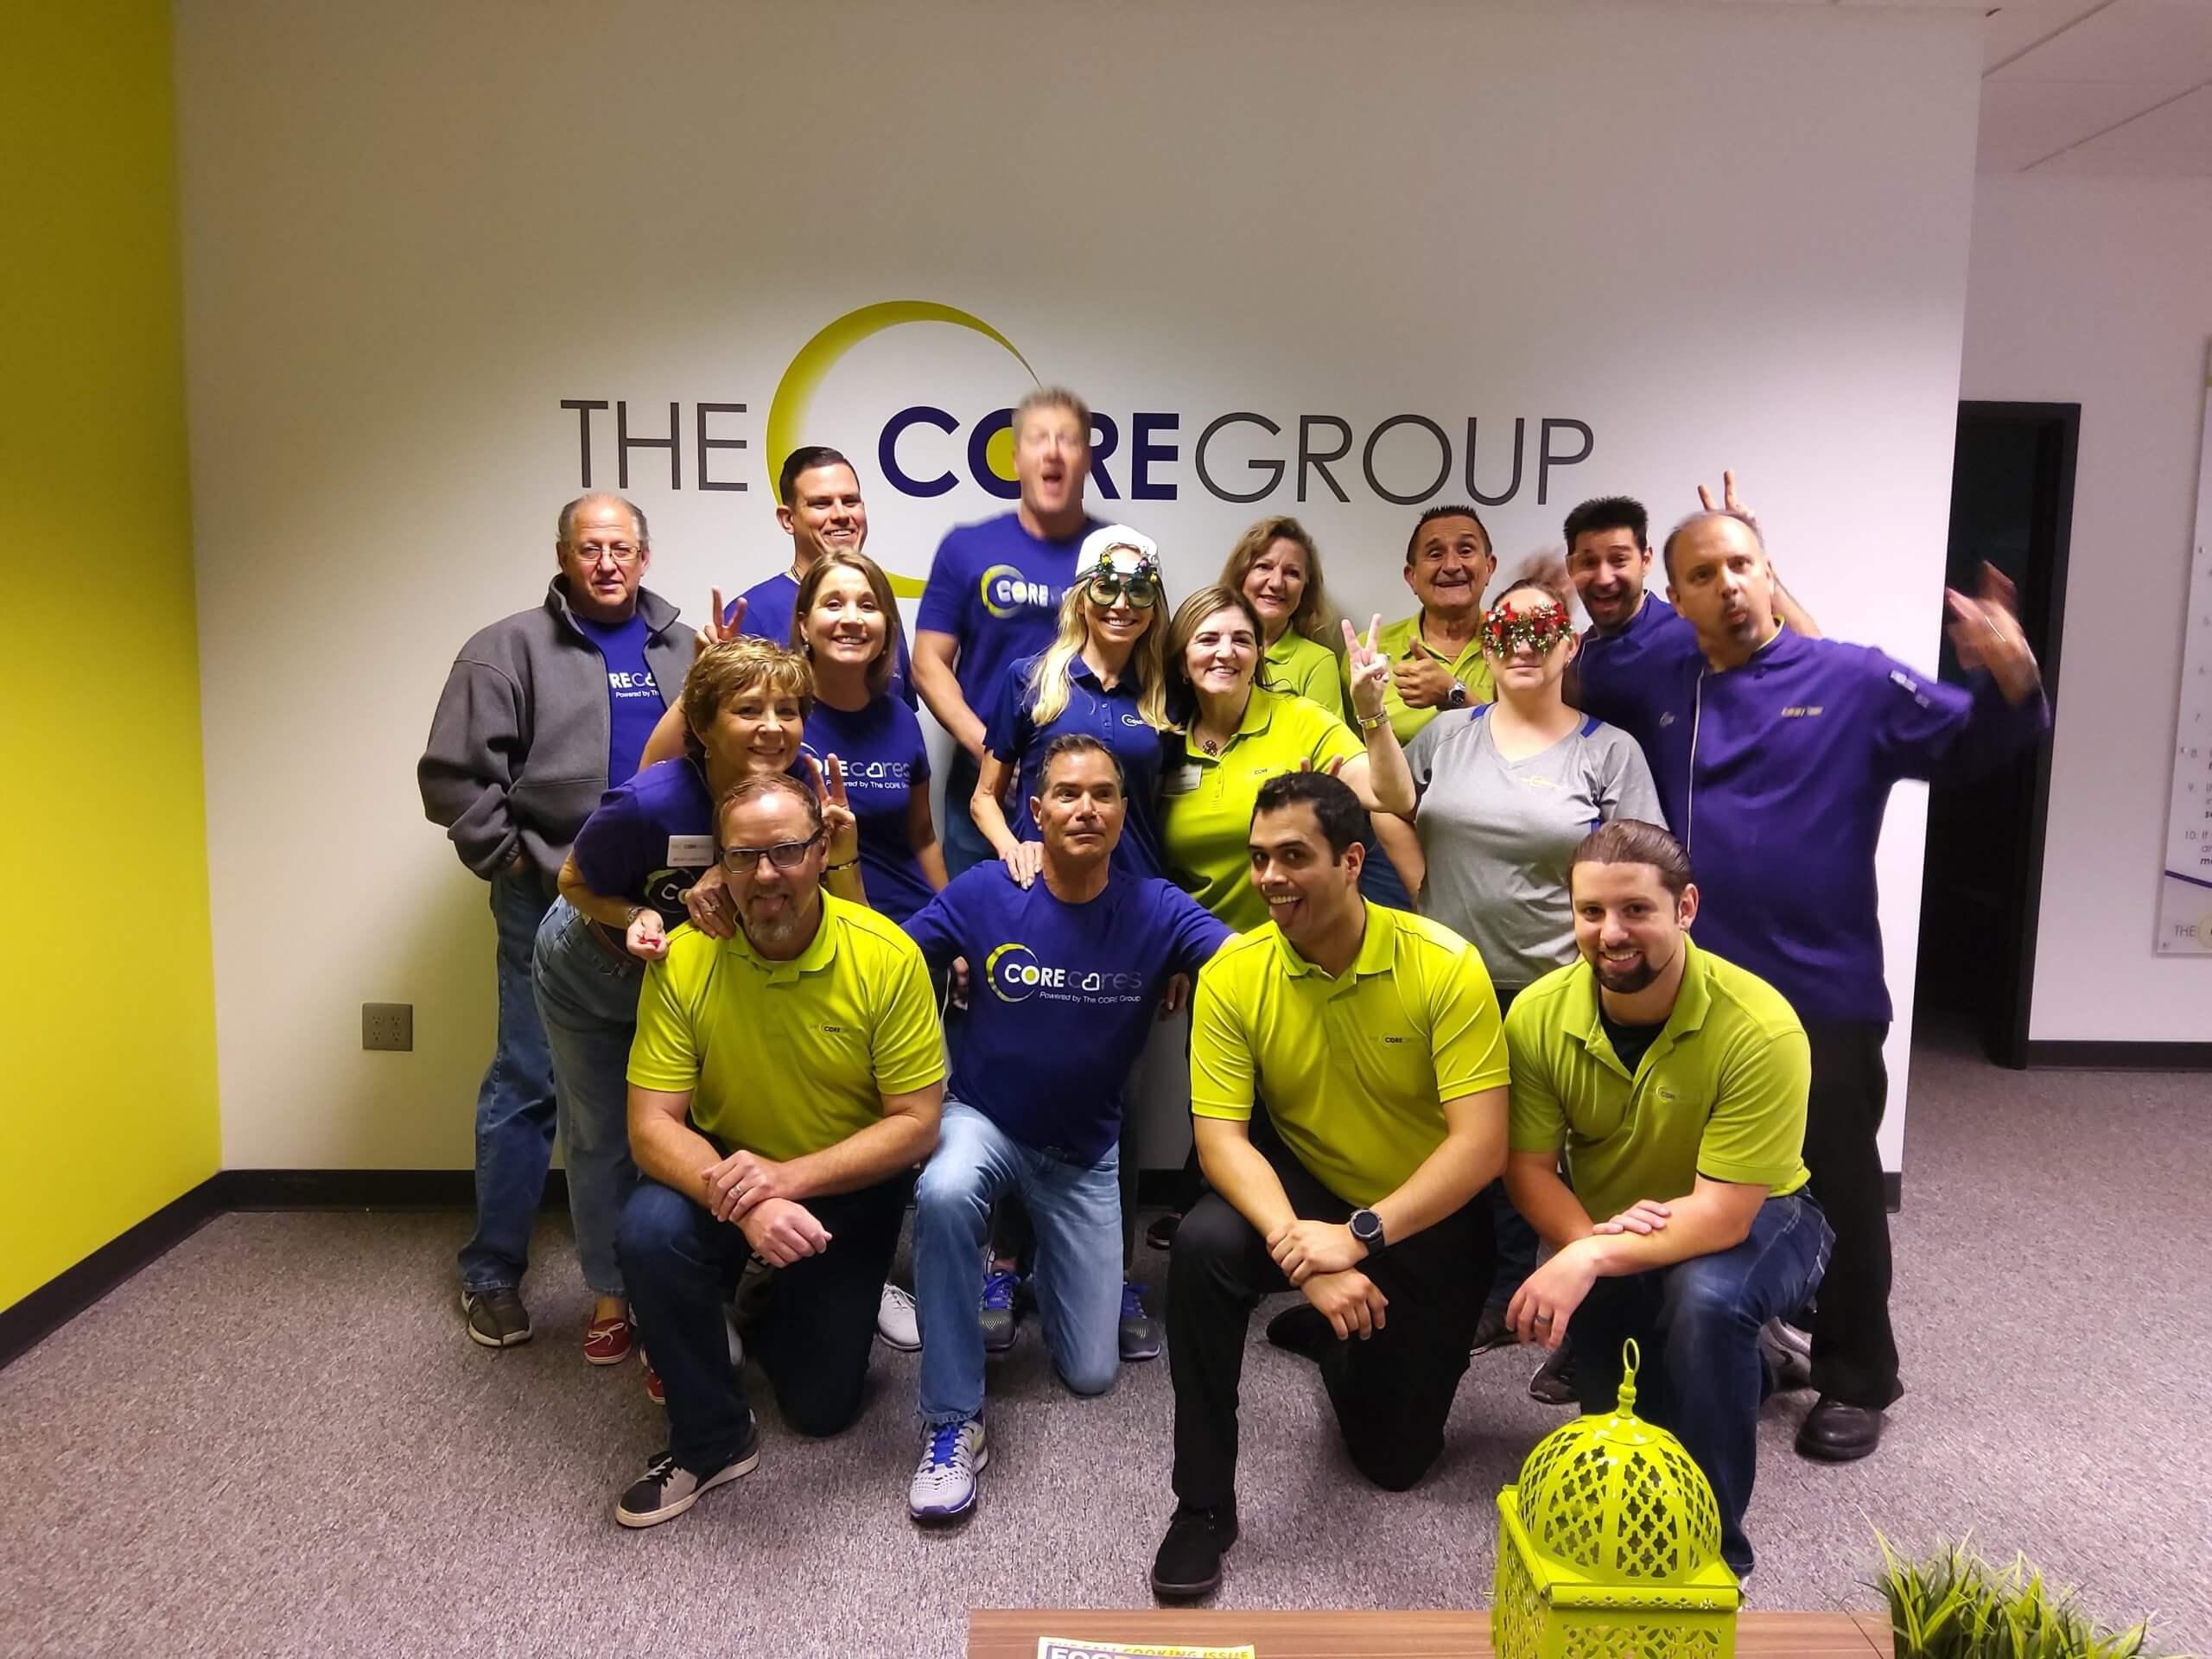 season of core caring 27